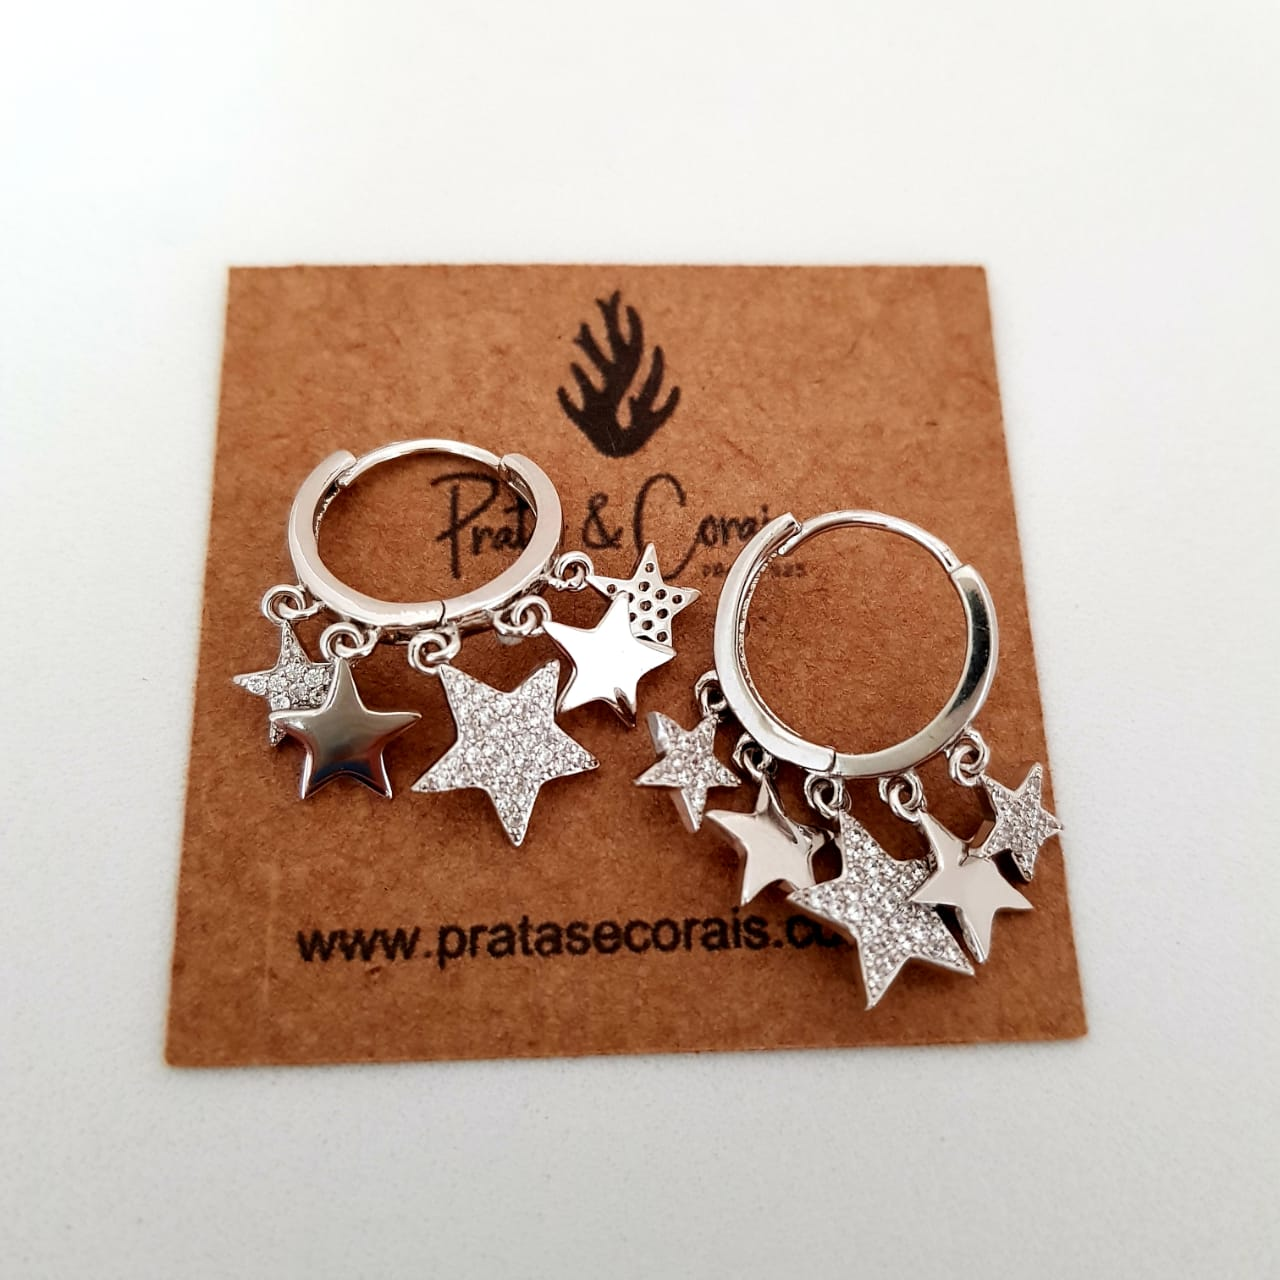 Brinco de Prata Argola com Estrela Ródio Branco